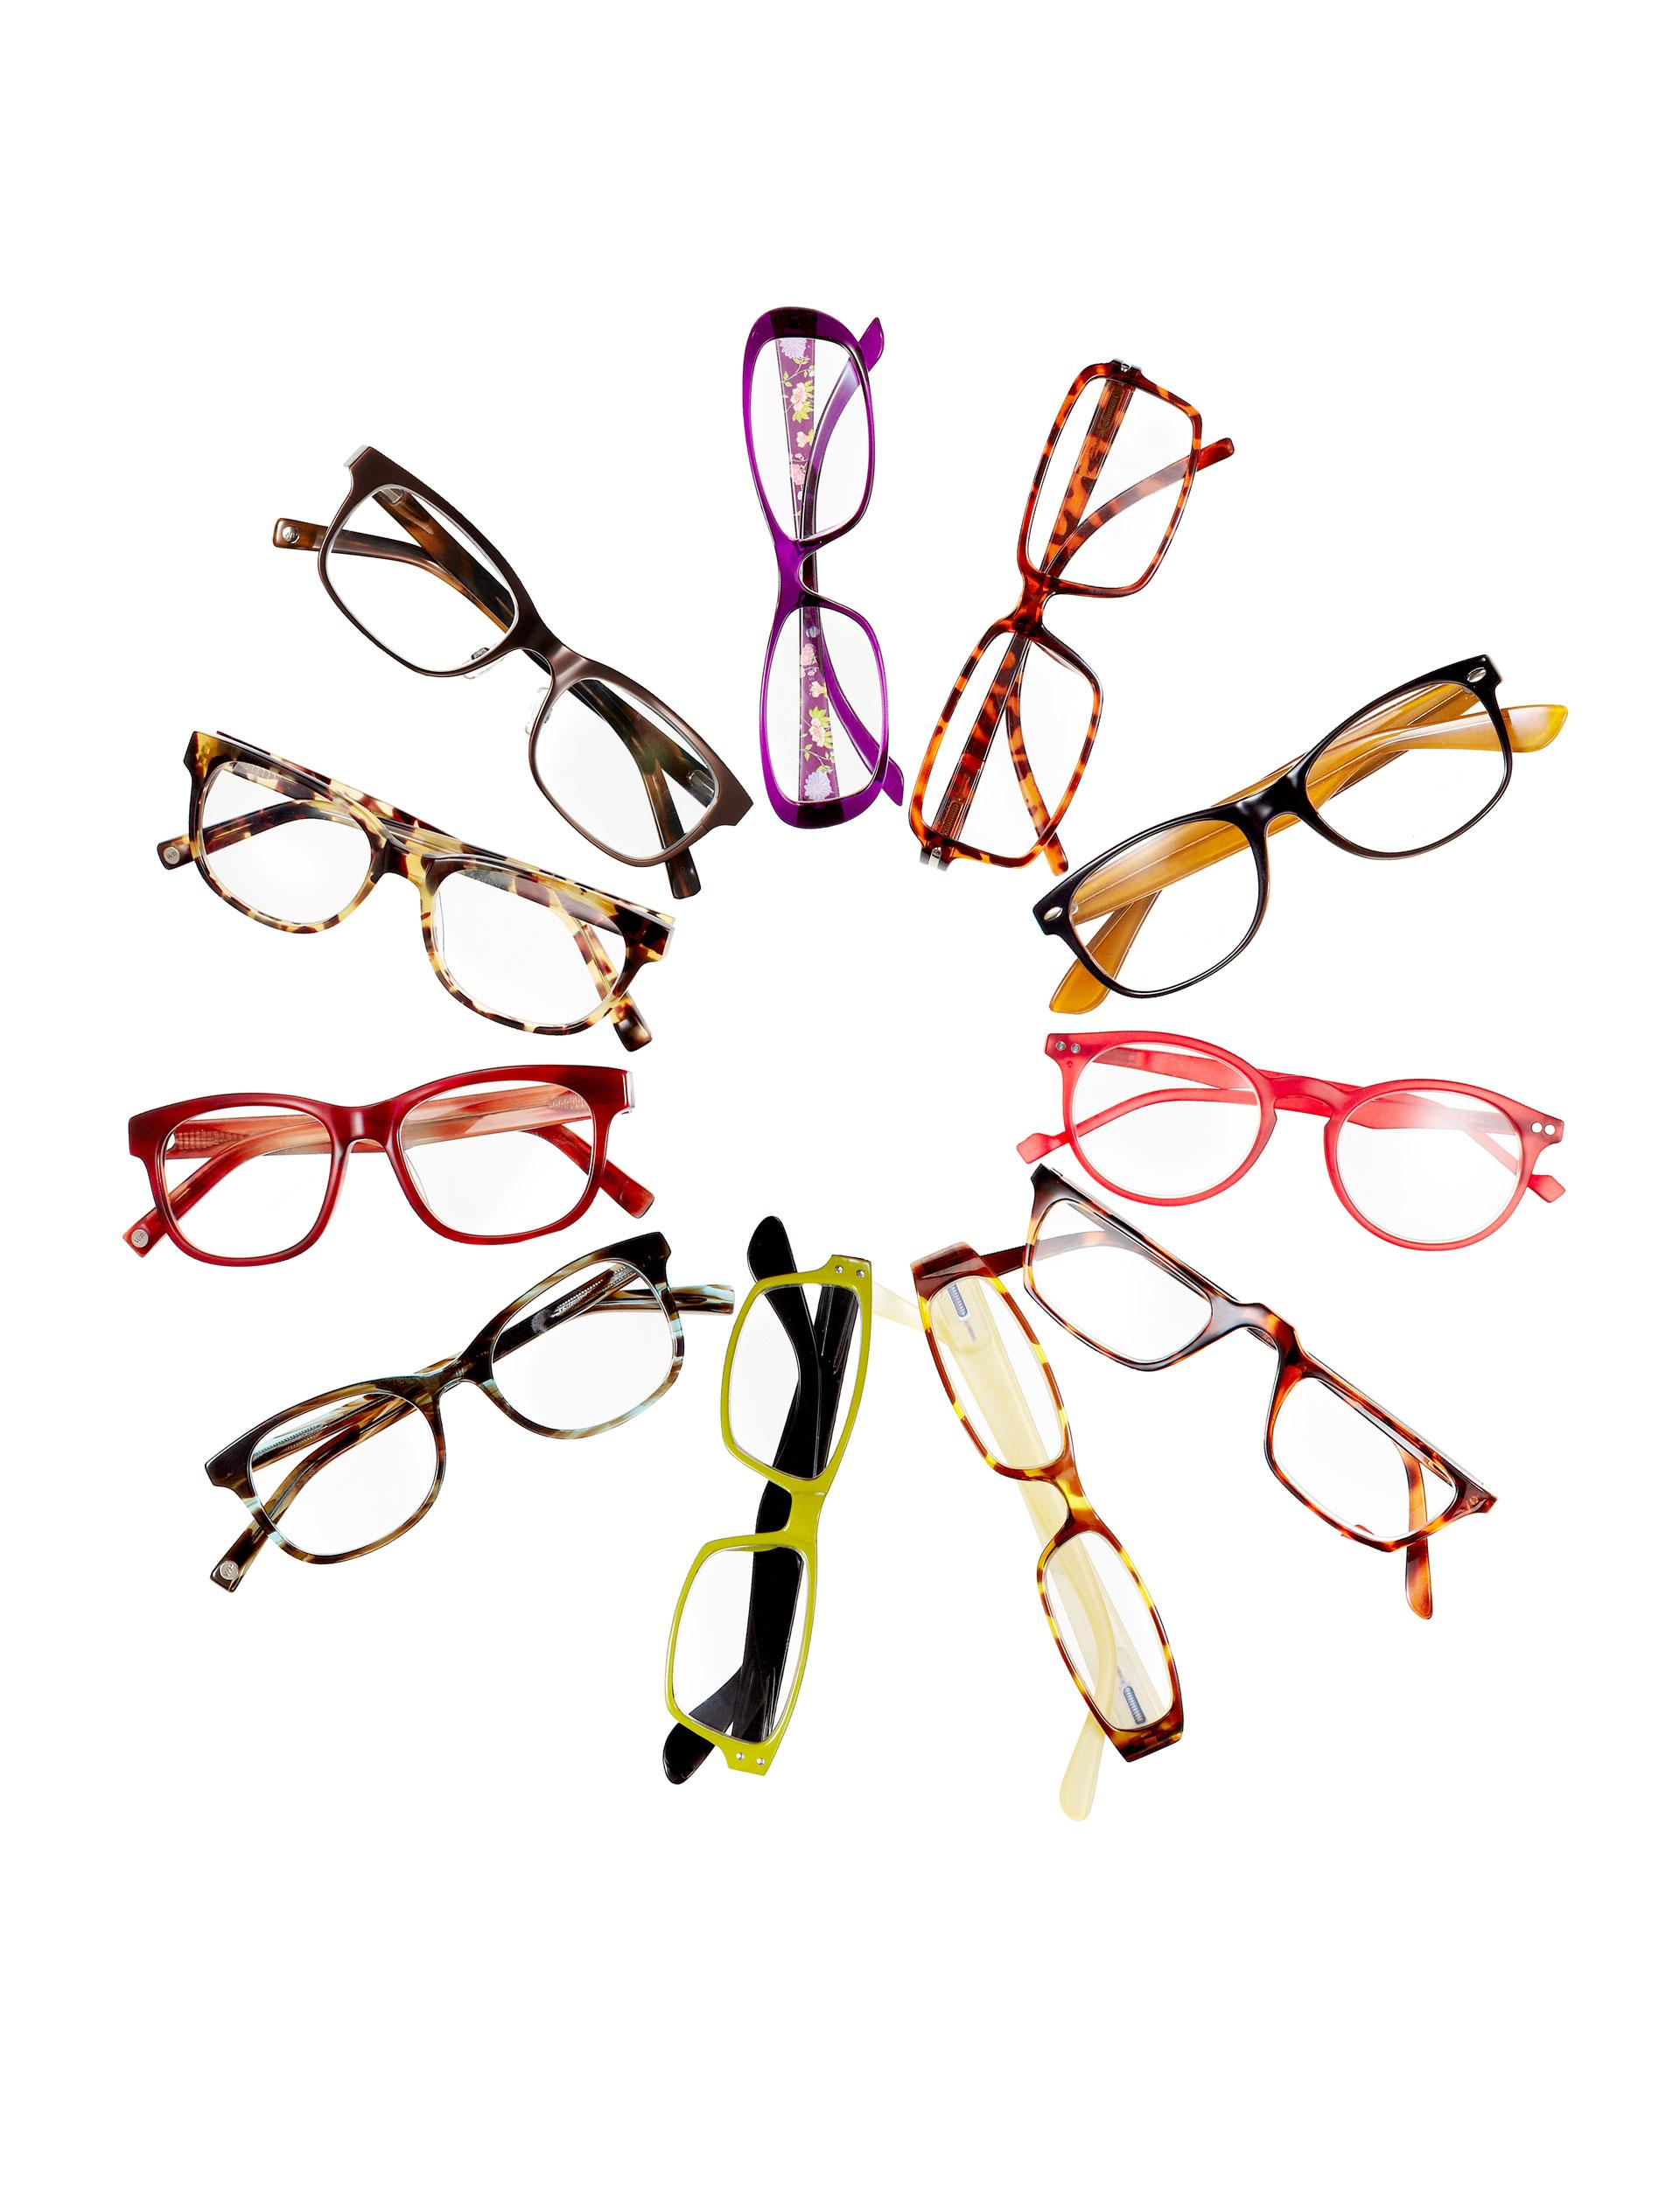 Buying Eyeglasses Online Budget Eyewear Websites